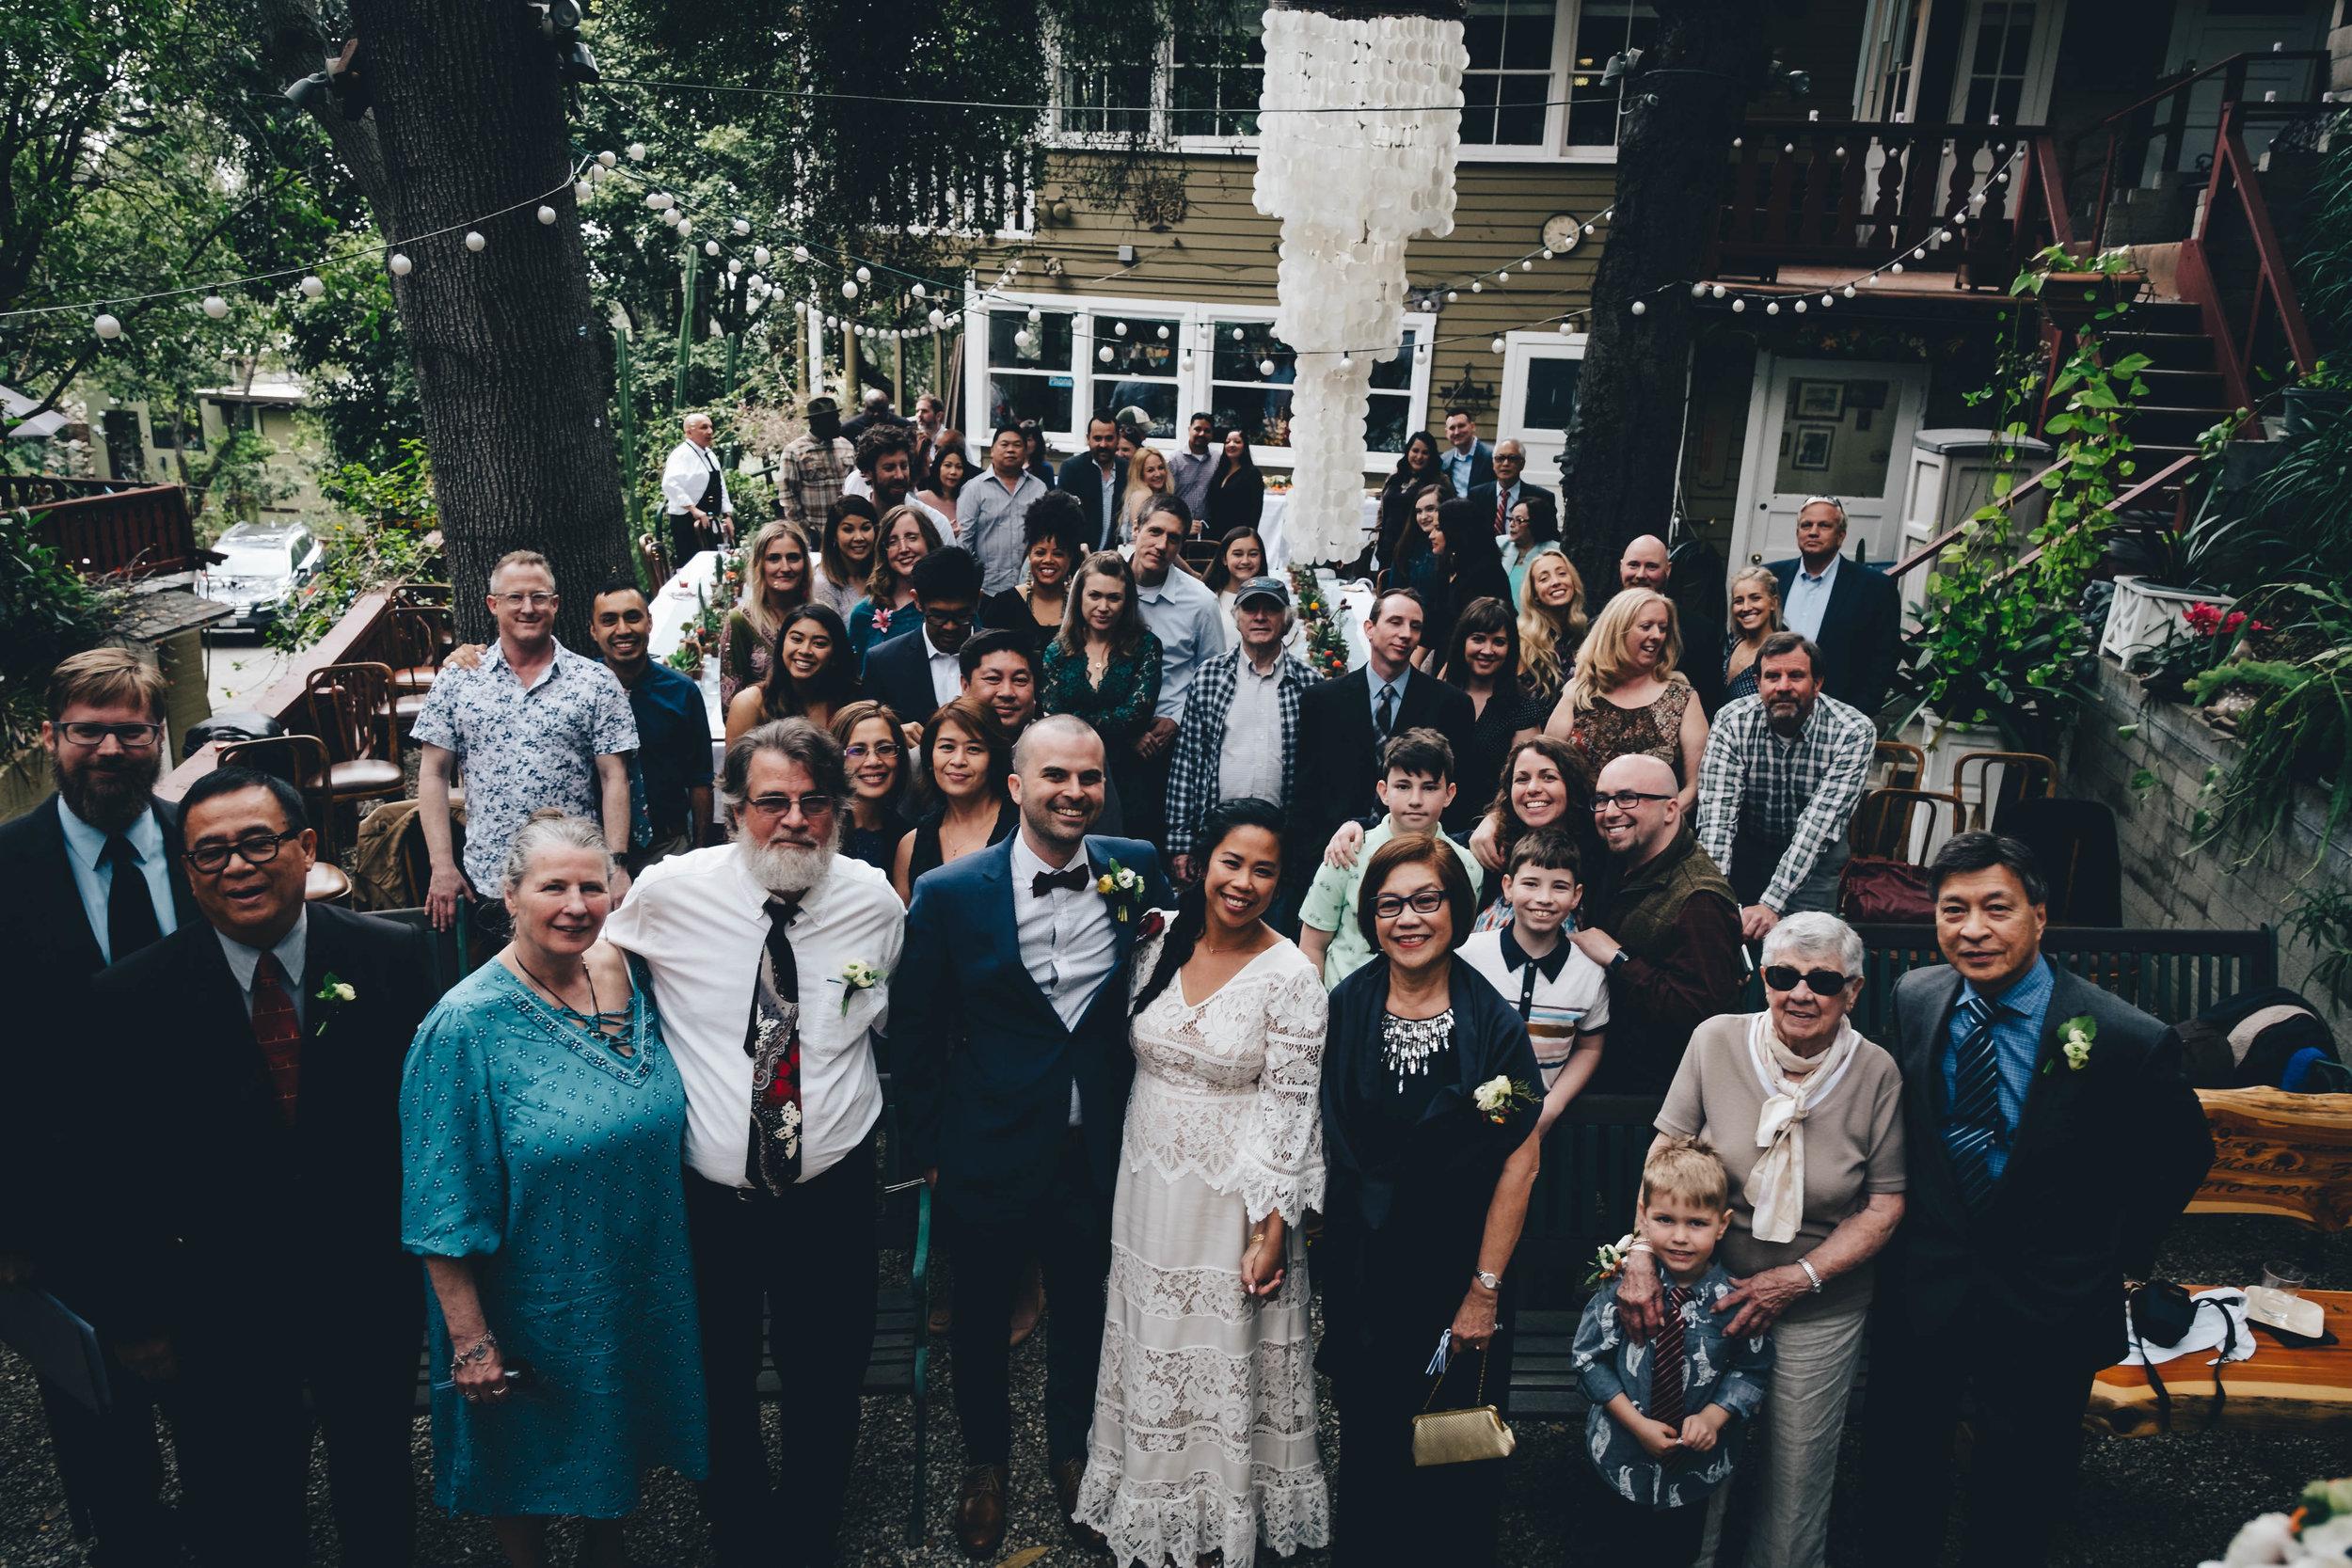 jj wedding (225 of 451).jpg